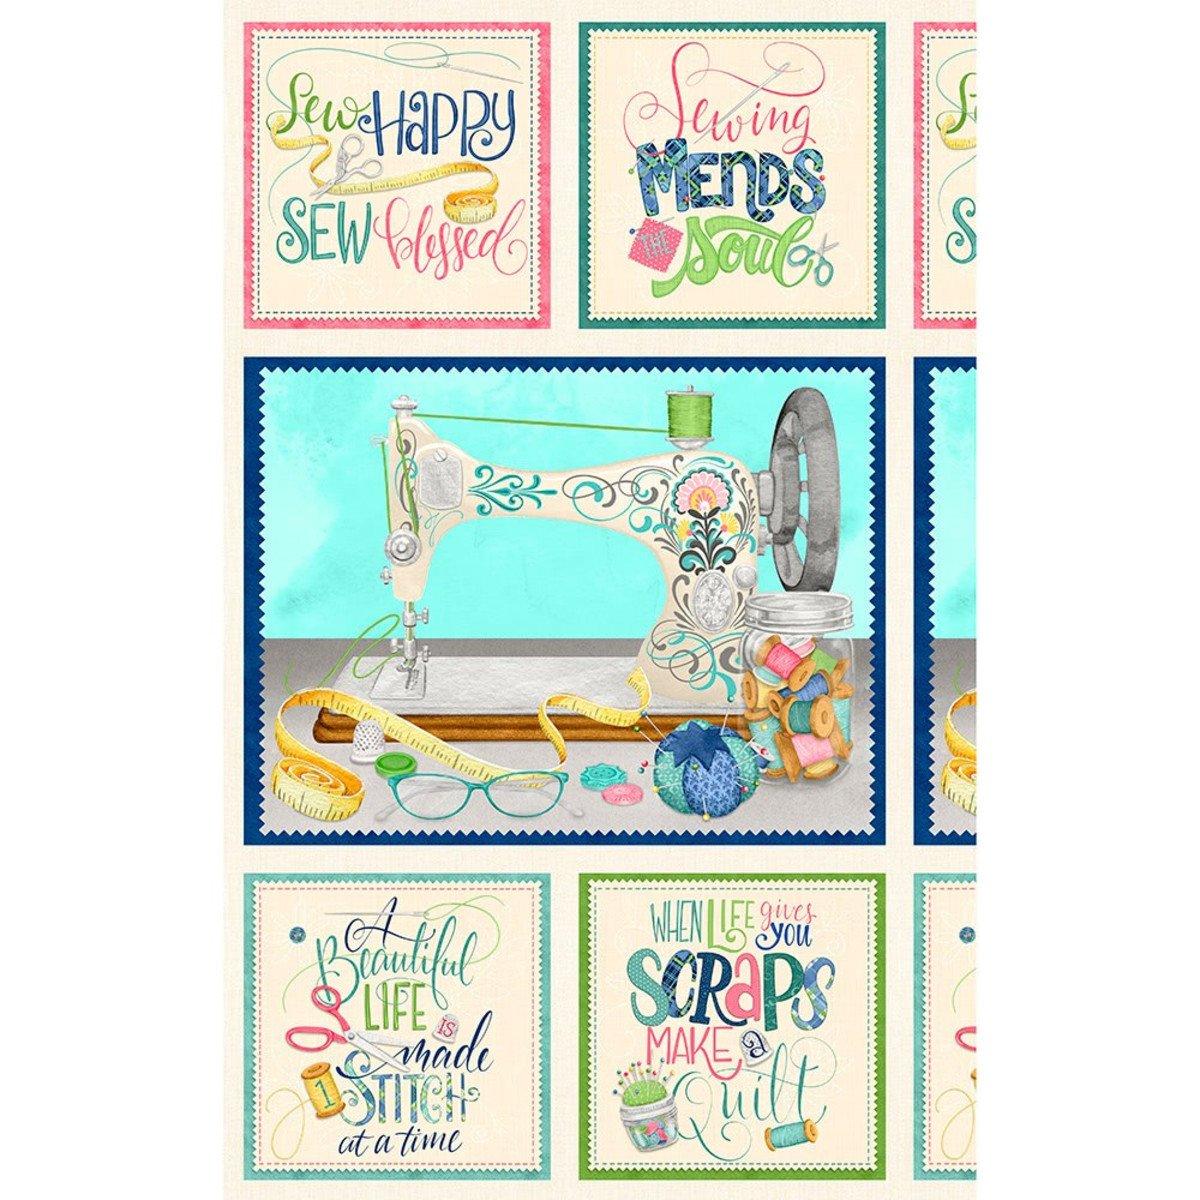 Sew Little Time Panel (24 x wof) Danielle Leone